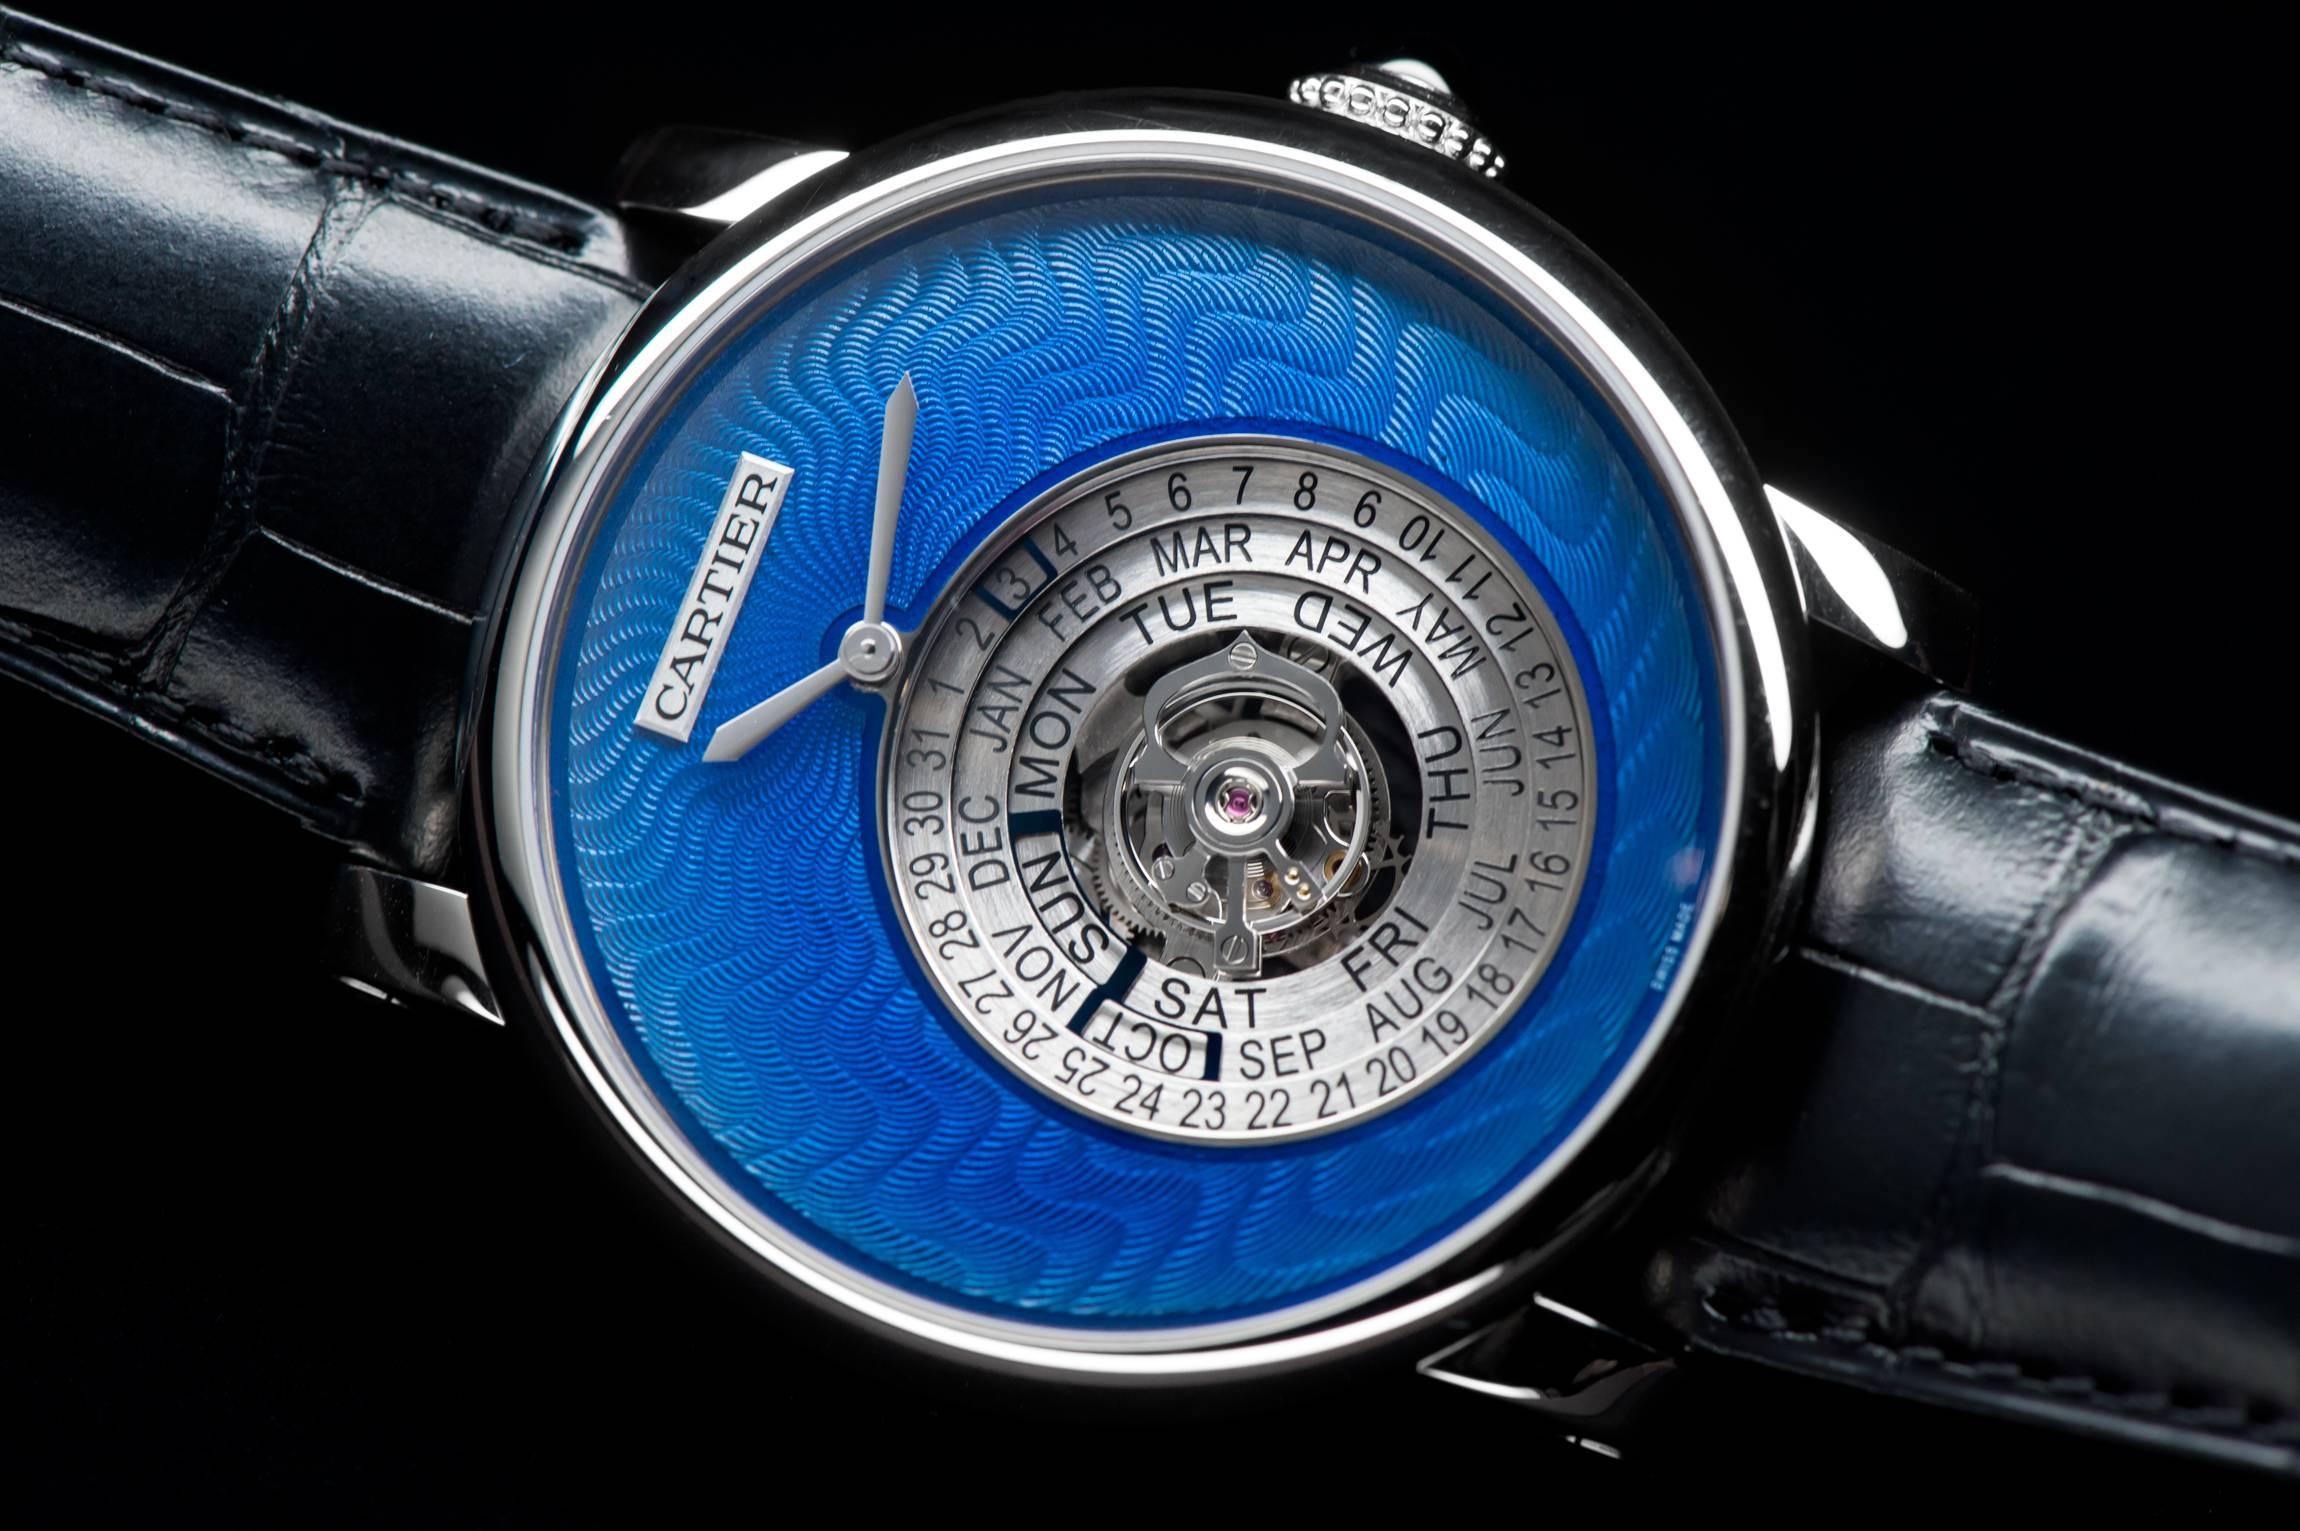 "Cartier Rotonde de Cartier Astrocalendaire, Tourbillon complication, perpetual calendar with circular display Calibre 9459 MC ""Poinçon de genève"" certified watch close up"